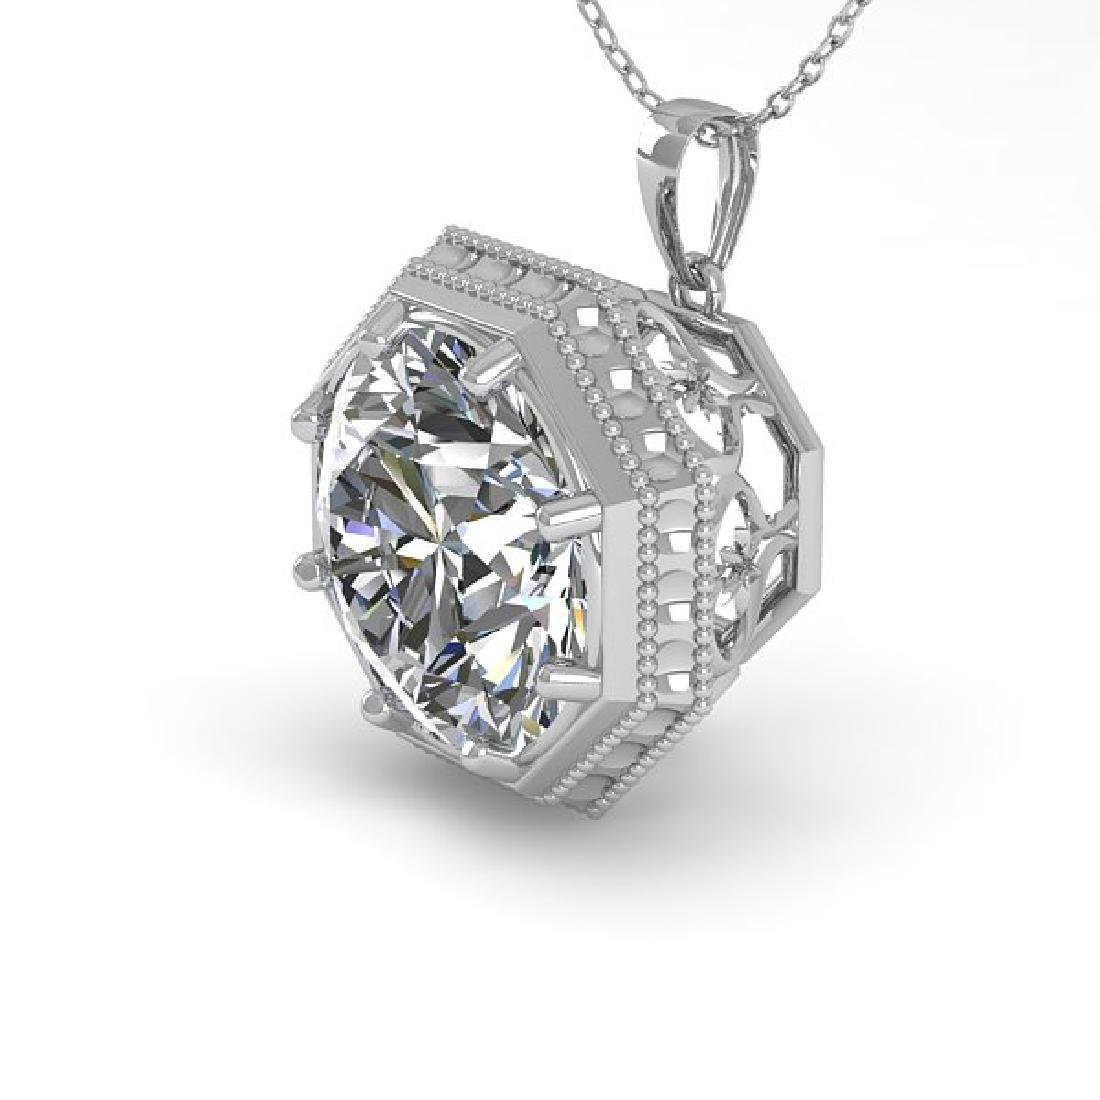 1.50 CTW VS/SI Diamond Solitaire Necklace 14K White